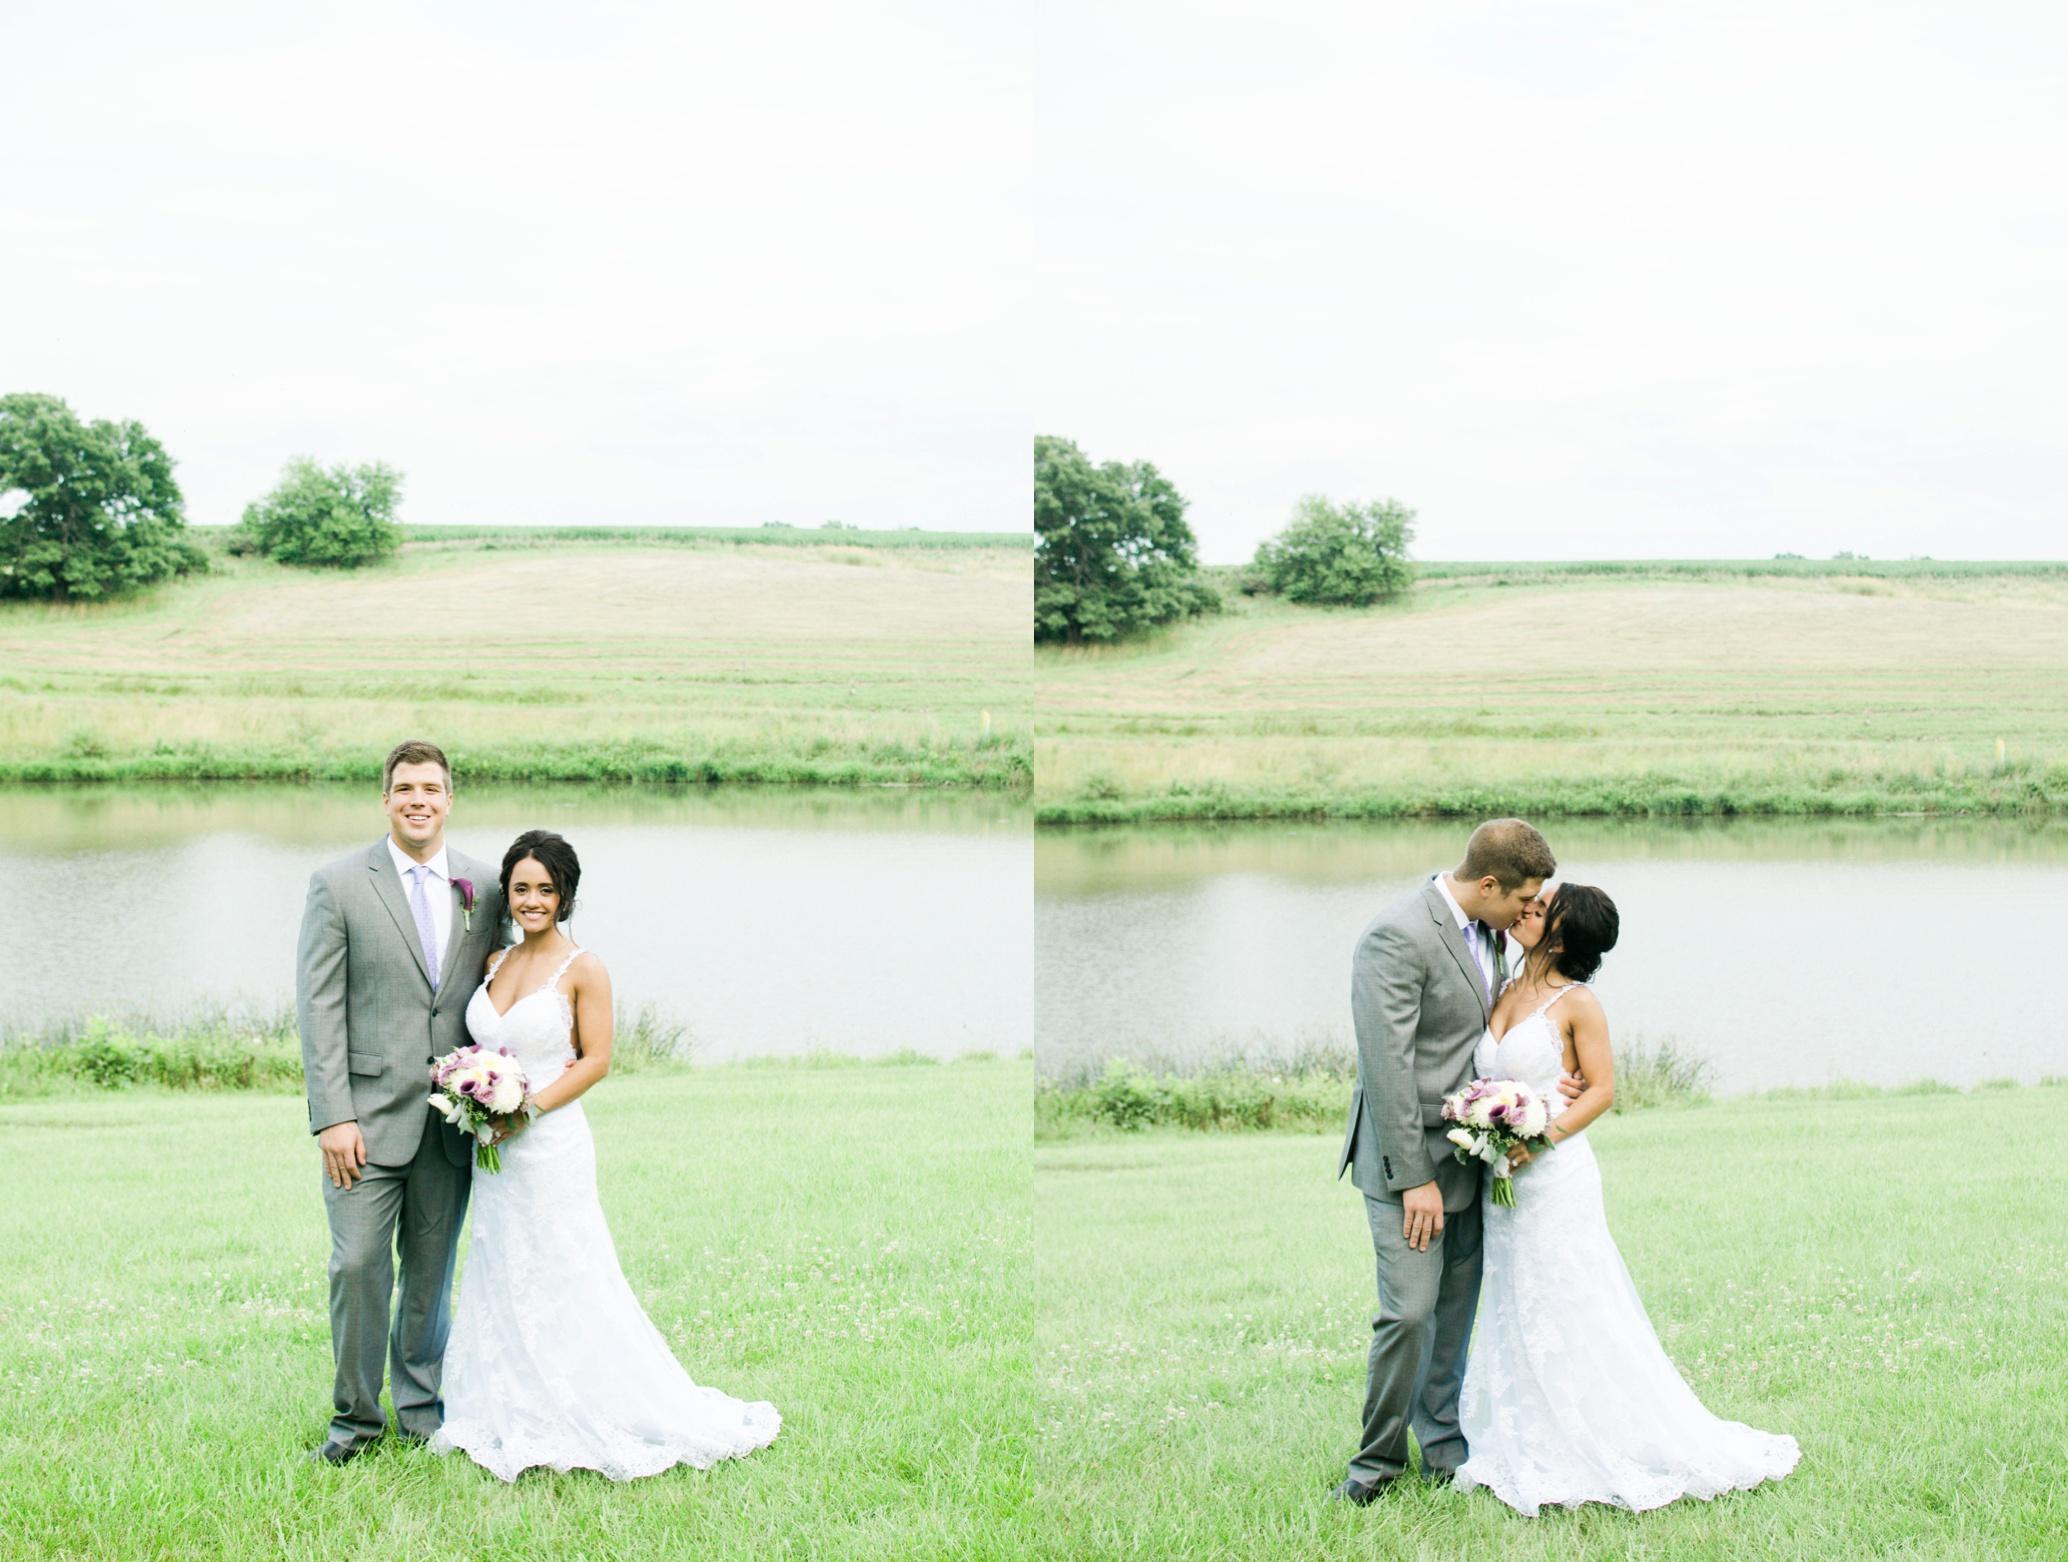 Barnes' Place Rustic Outdoor Wedding | Ali Leigh Photo Minneapolis Wedding Photographer_0200.jpg